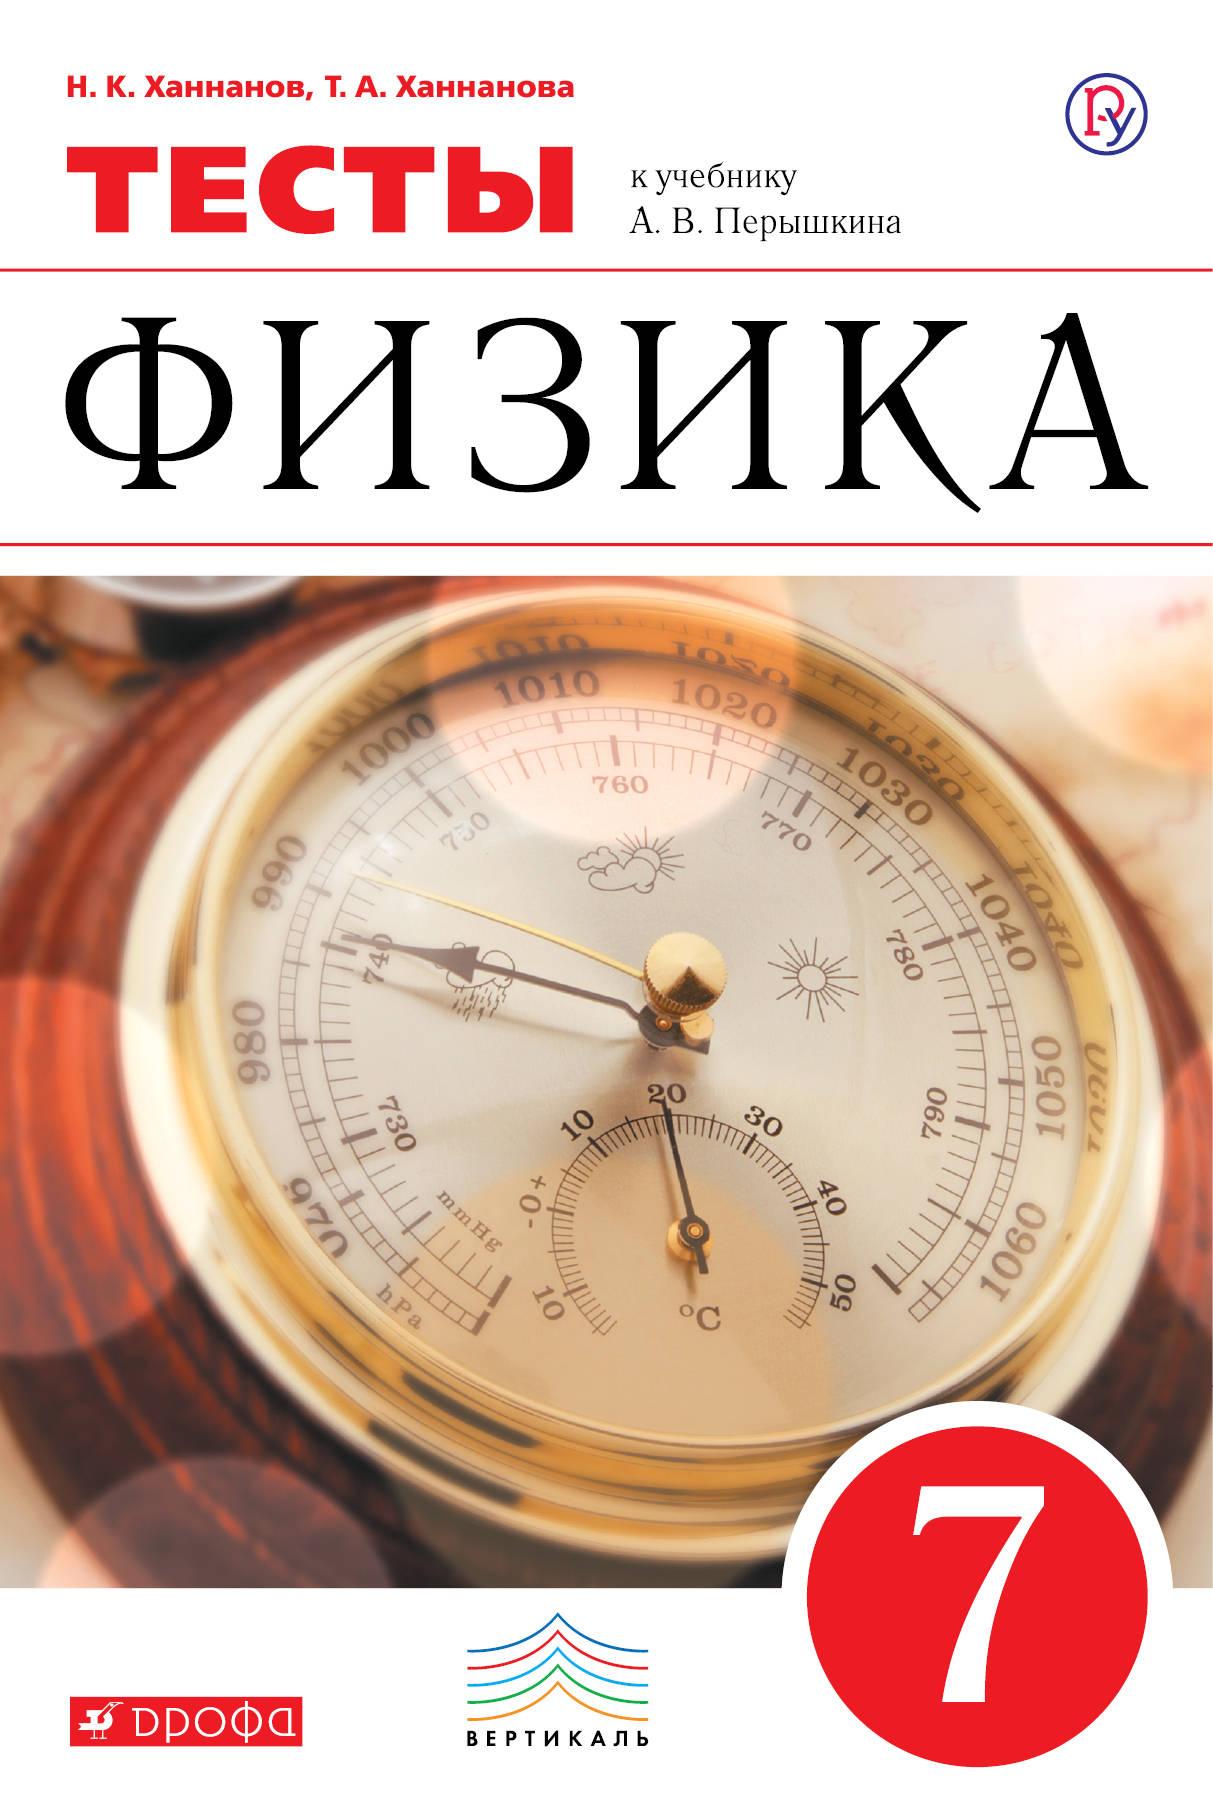 Н. К. Ханнанов,Т. А. Ханнанова Физика. 7 класс. Тесты.